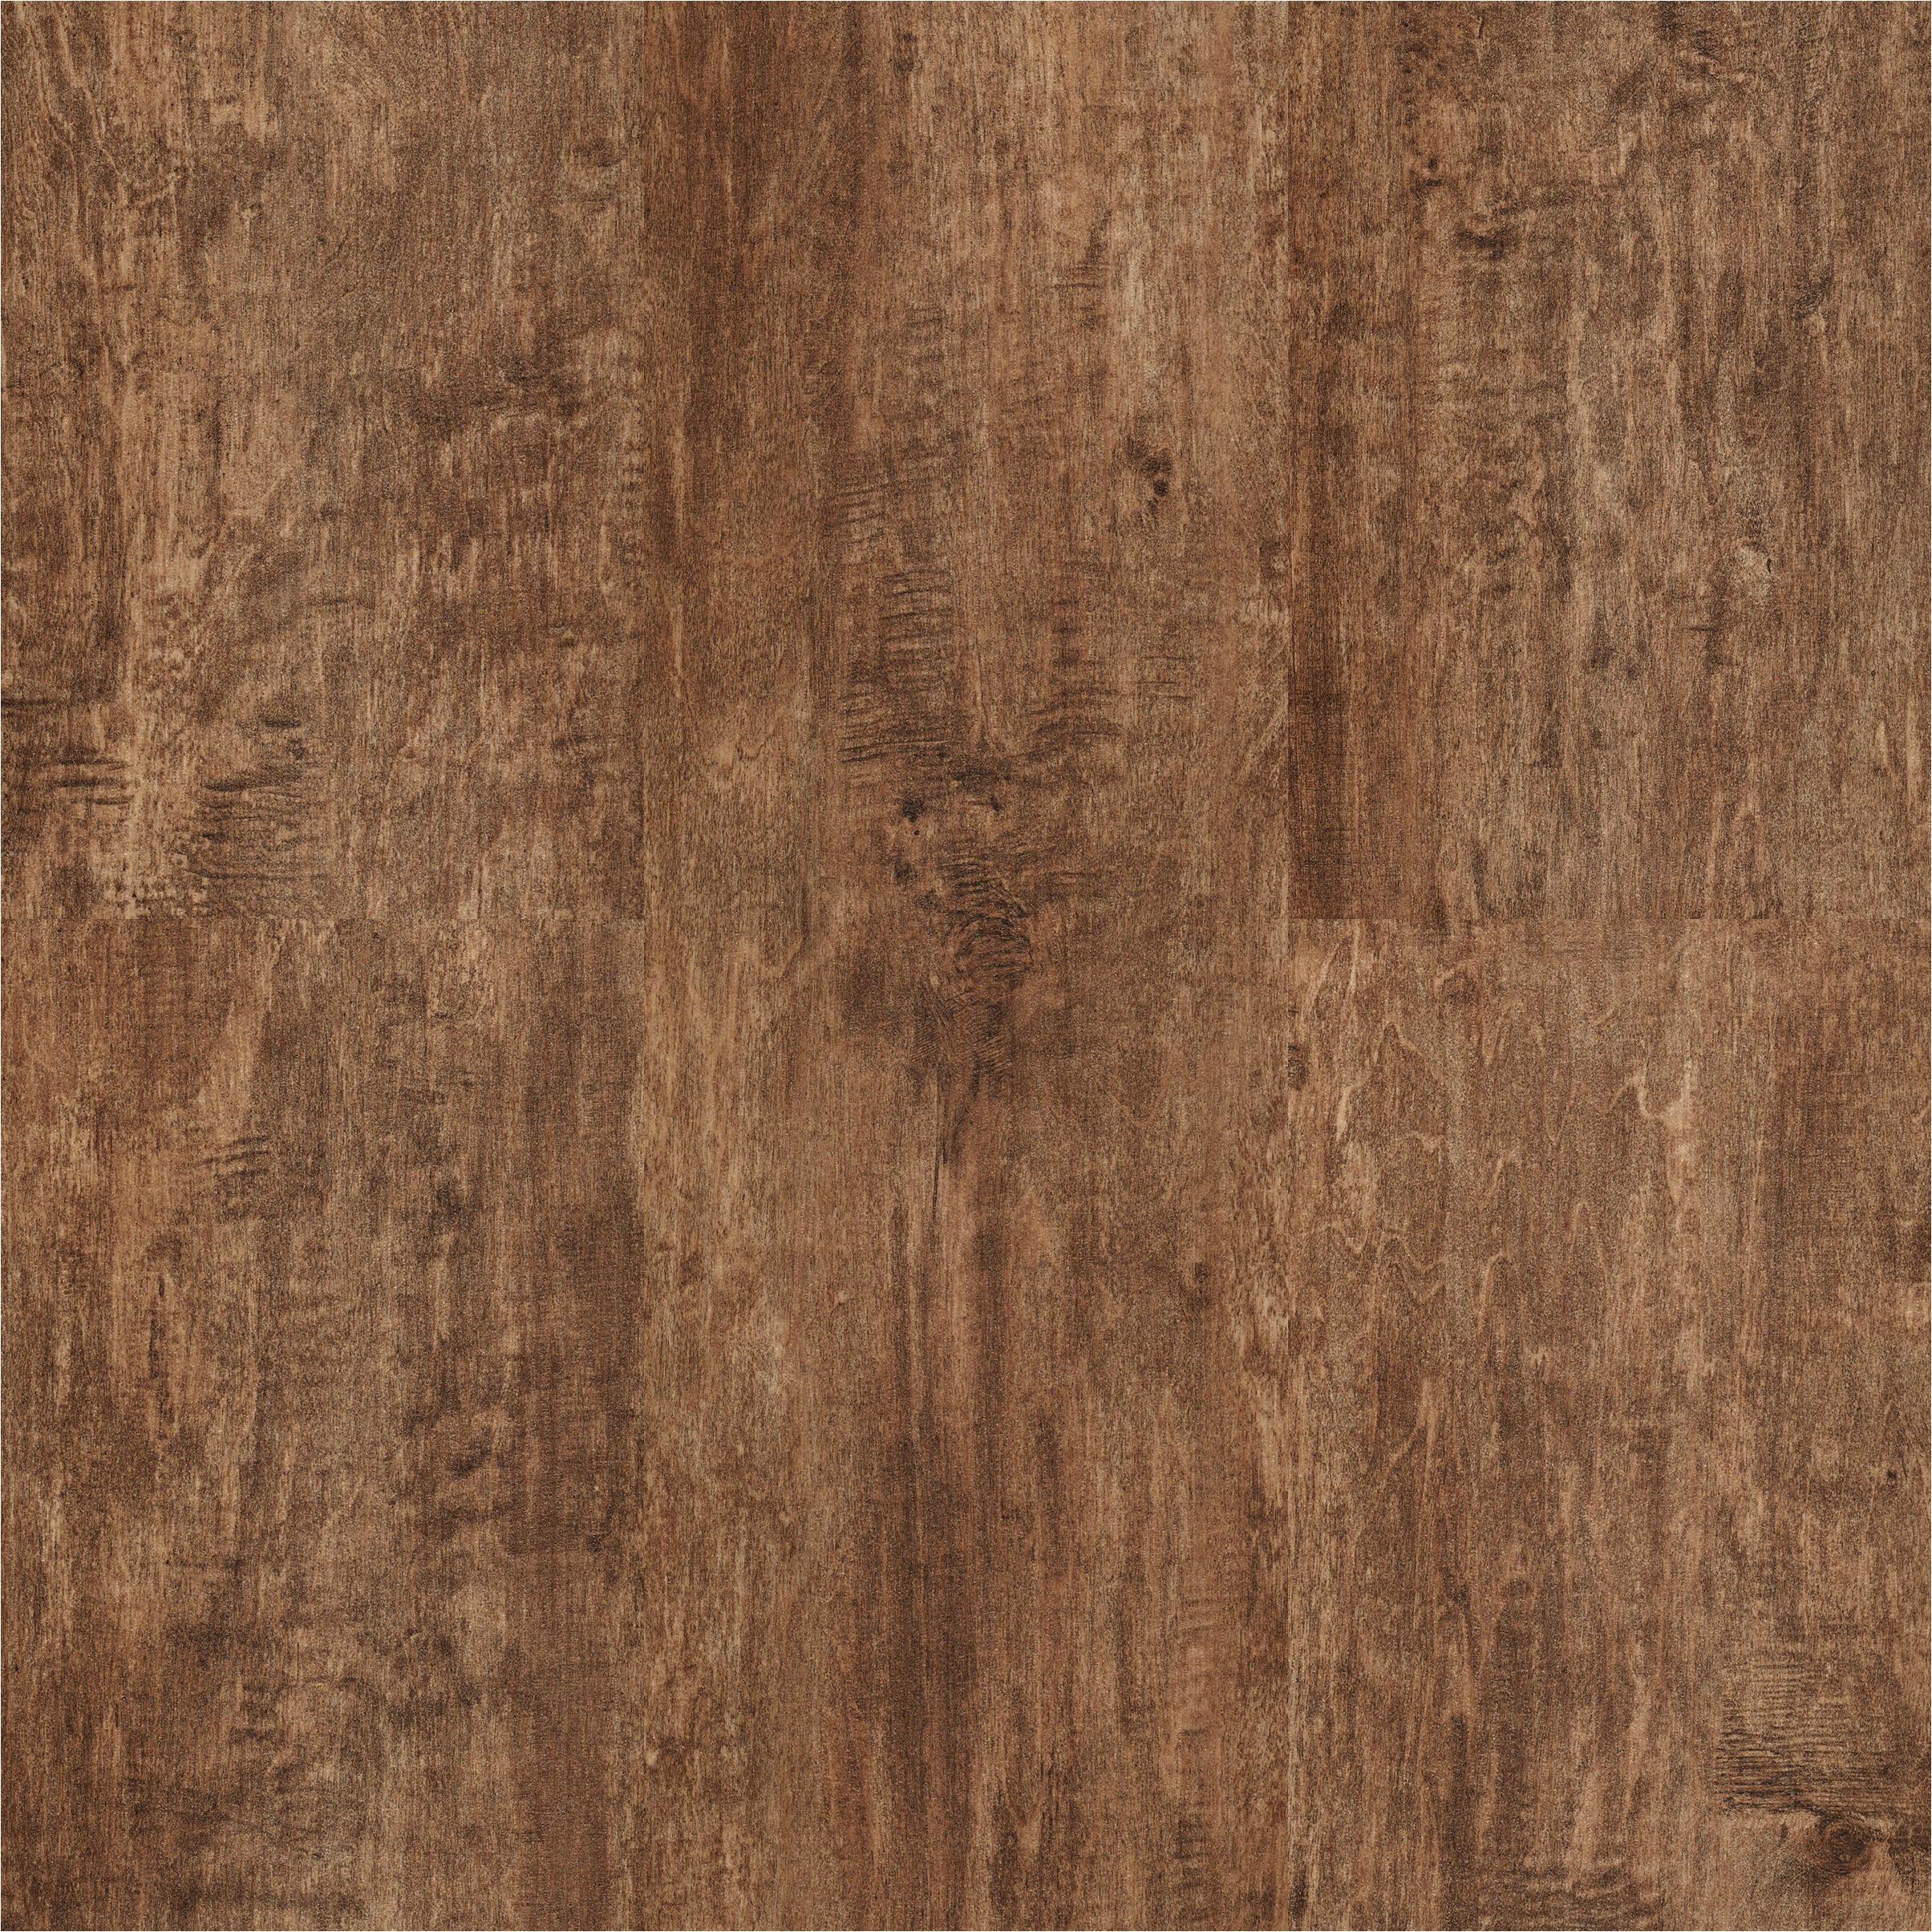 17068 premier glueless laminate flooring light maple